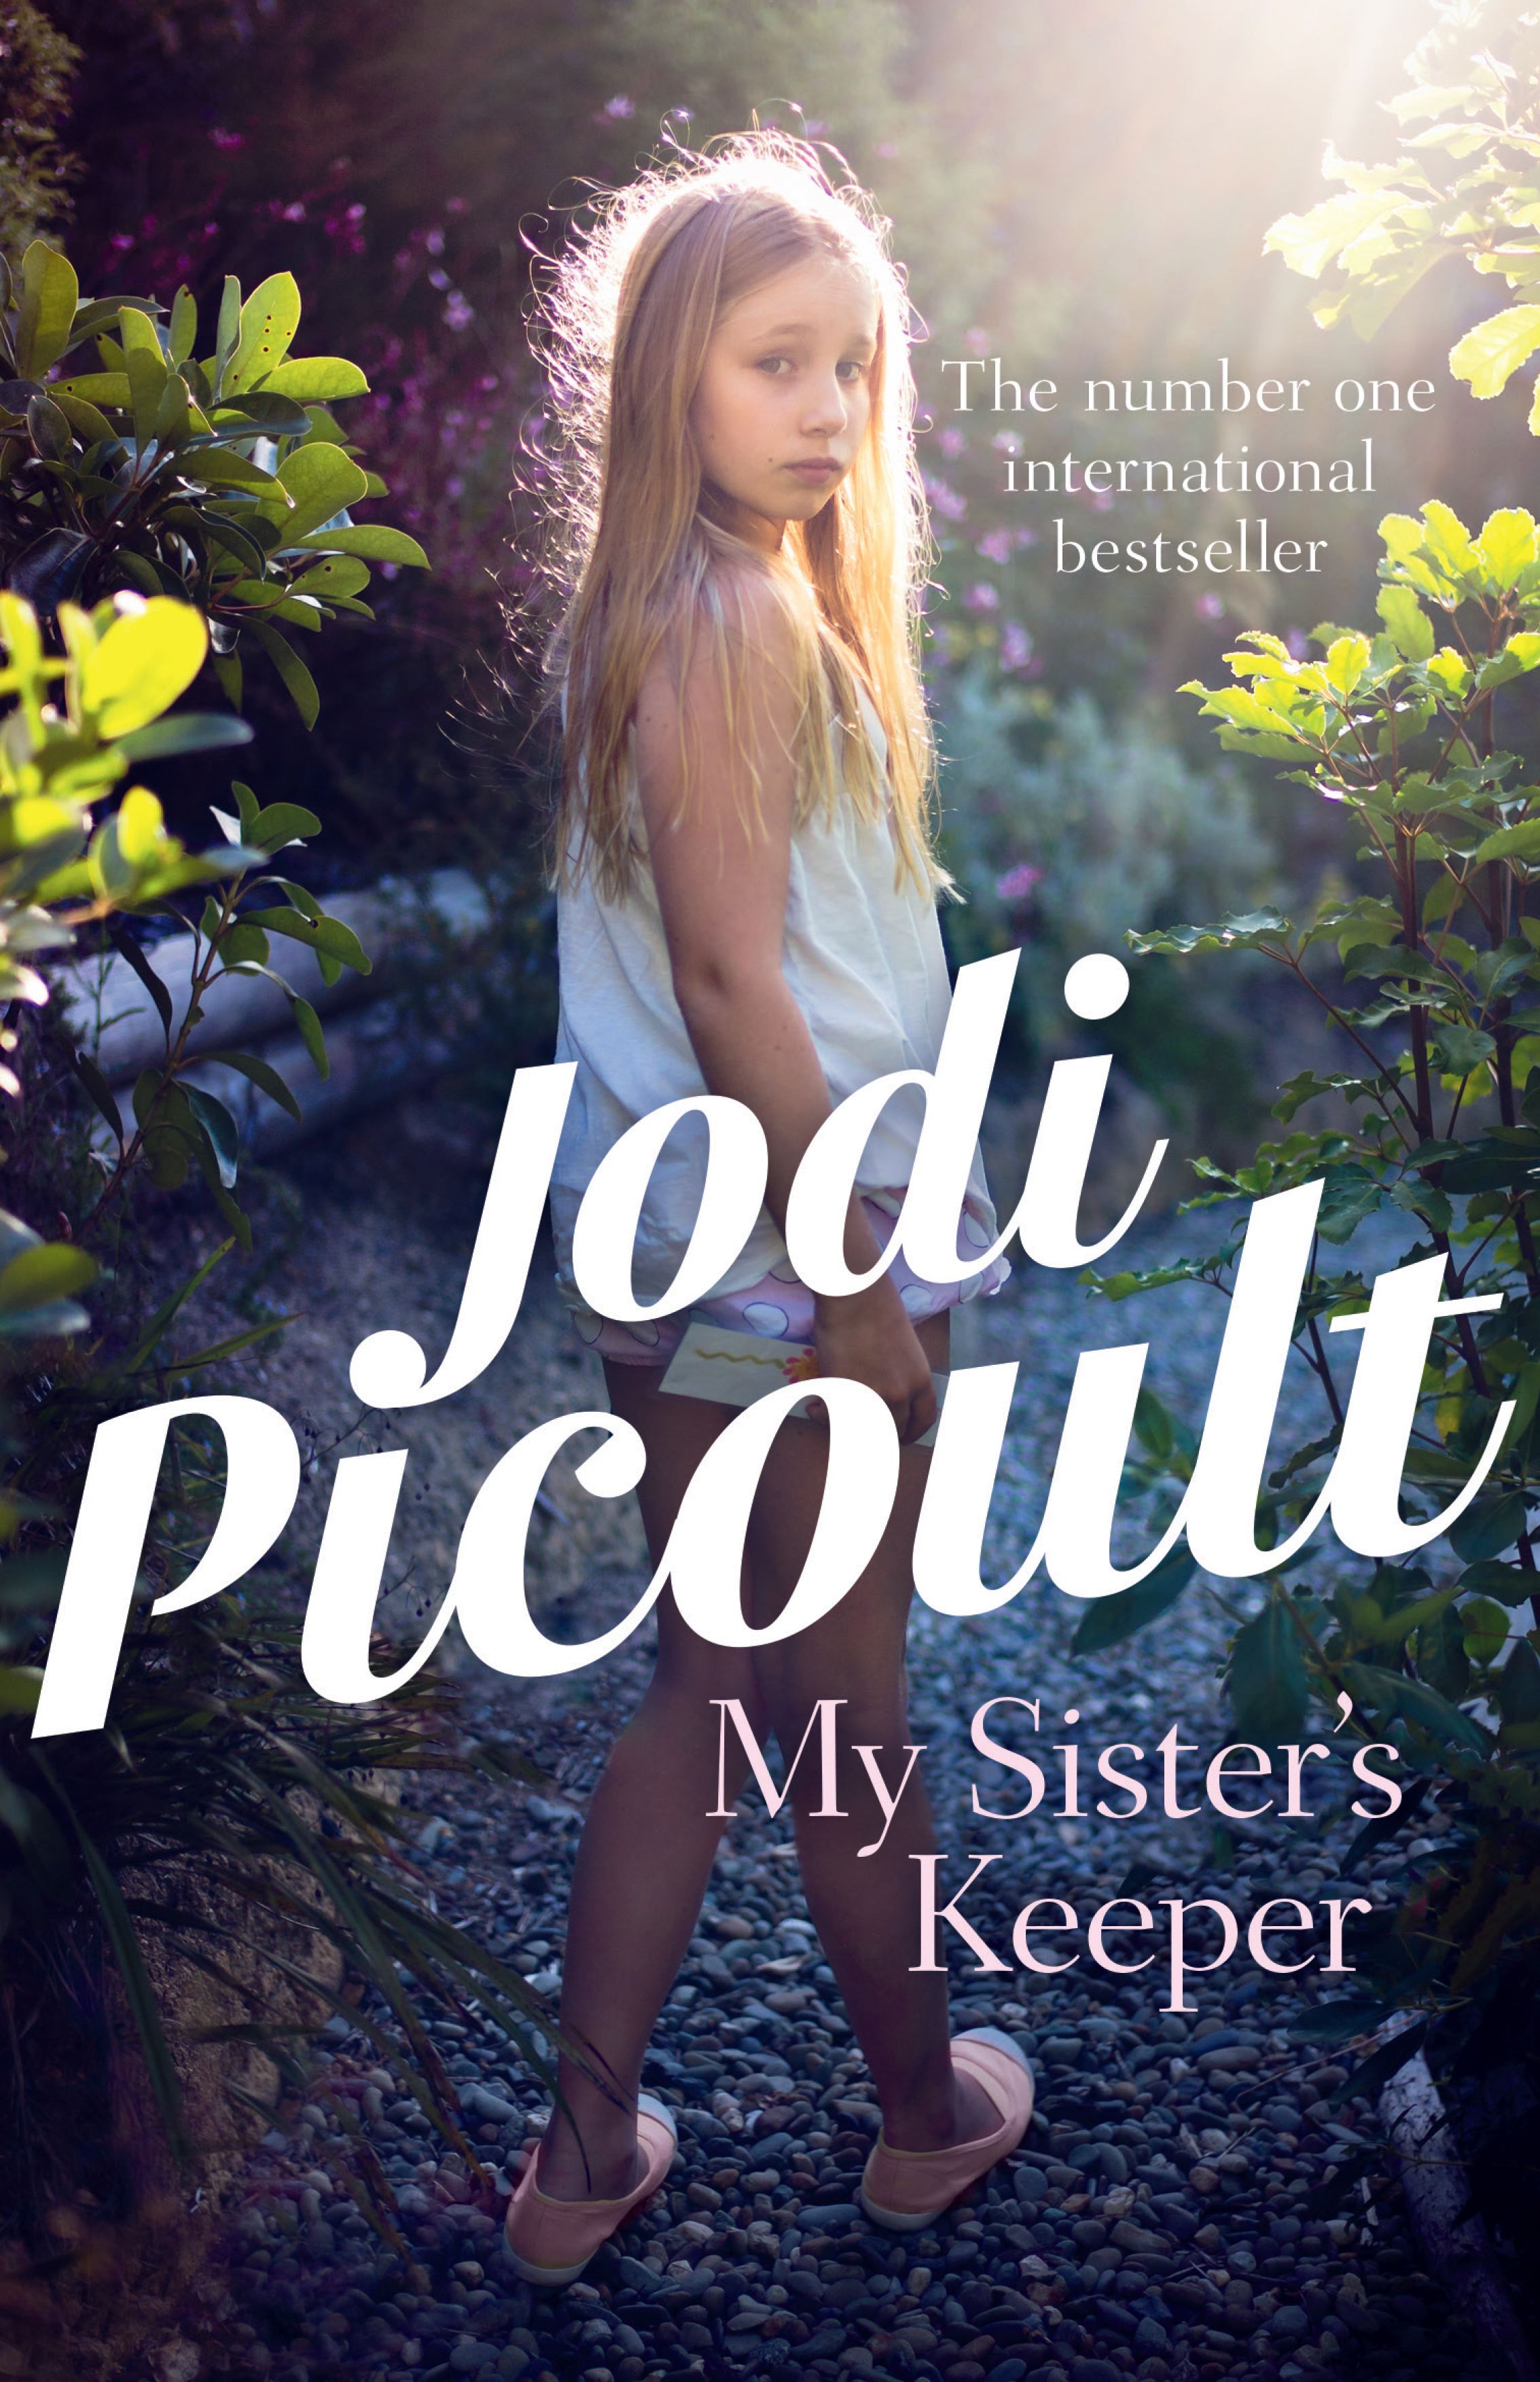 My Sister's Keeper - Jodi Picoult - 9781743318959 - Allen ...